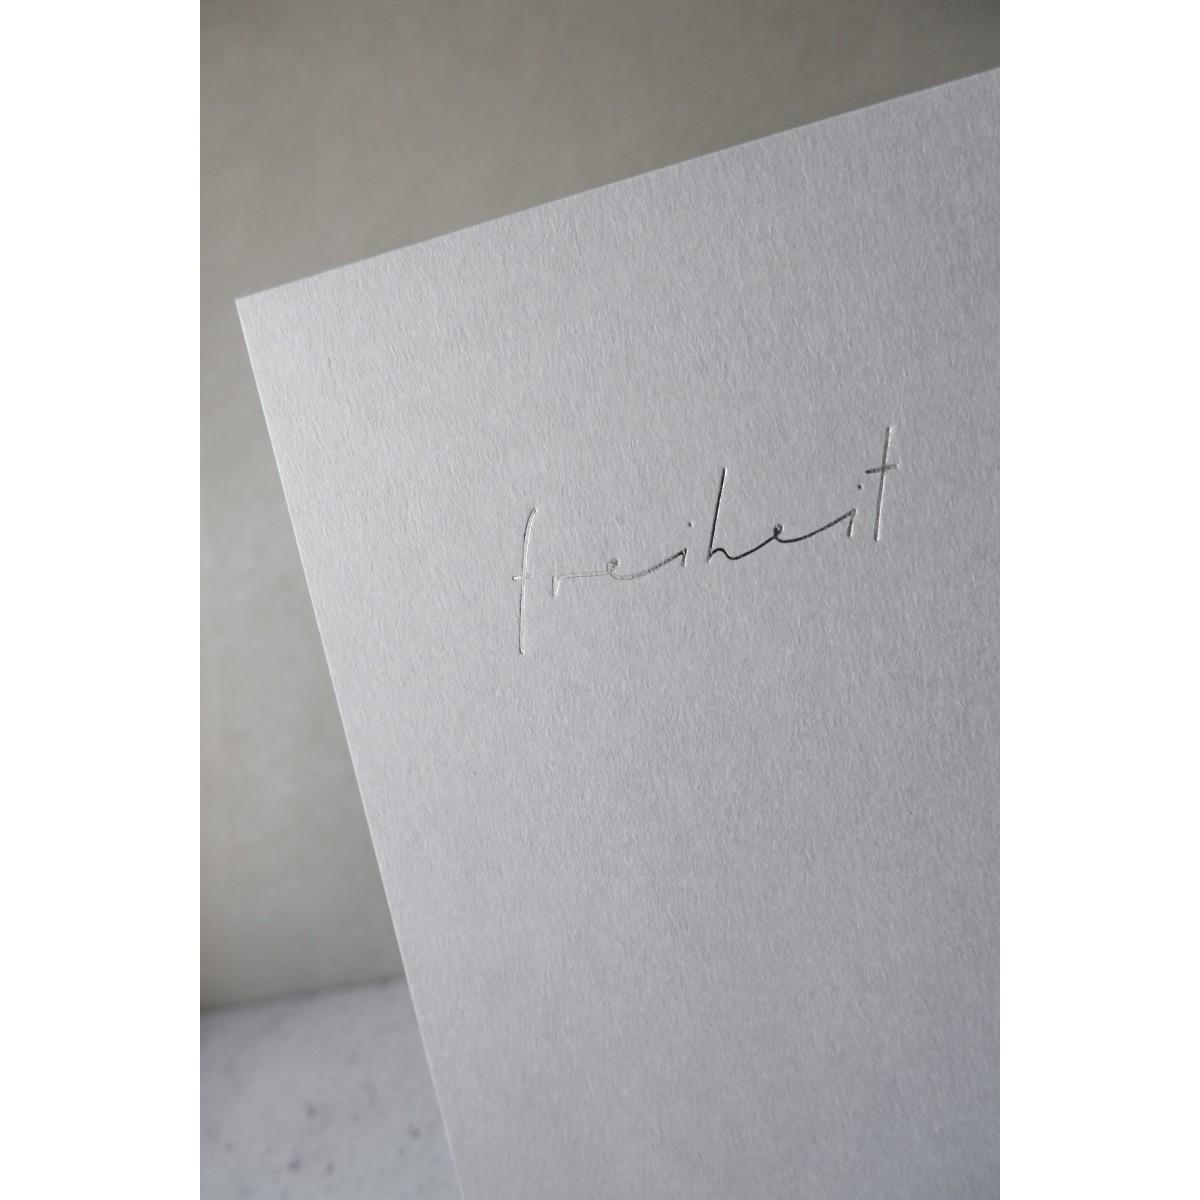 FREIHEIT - A5 Print - Letterpress – Anna Cosma